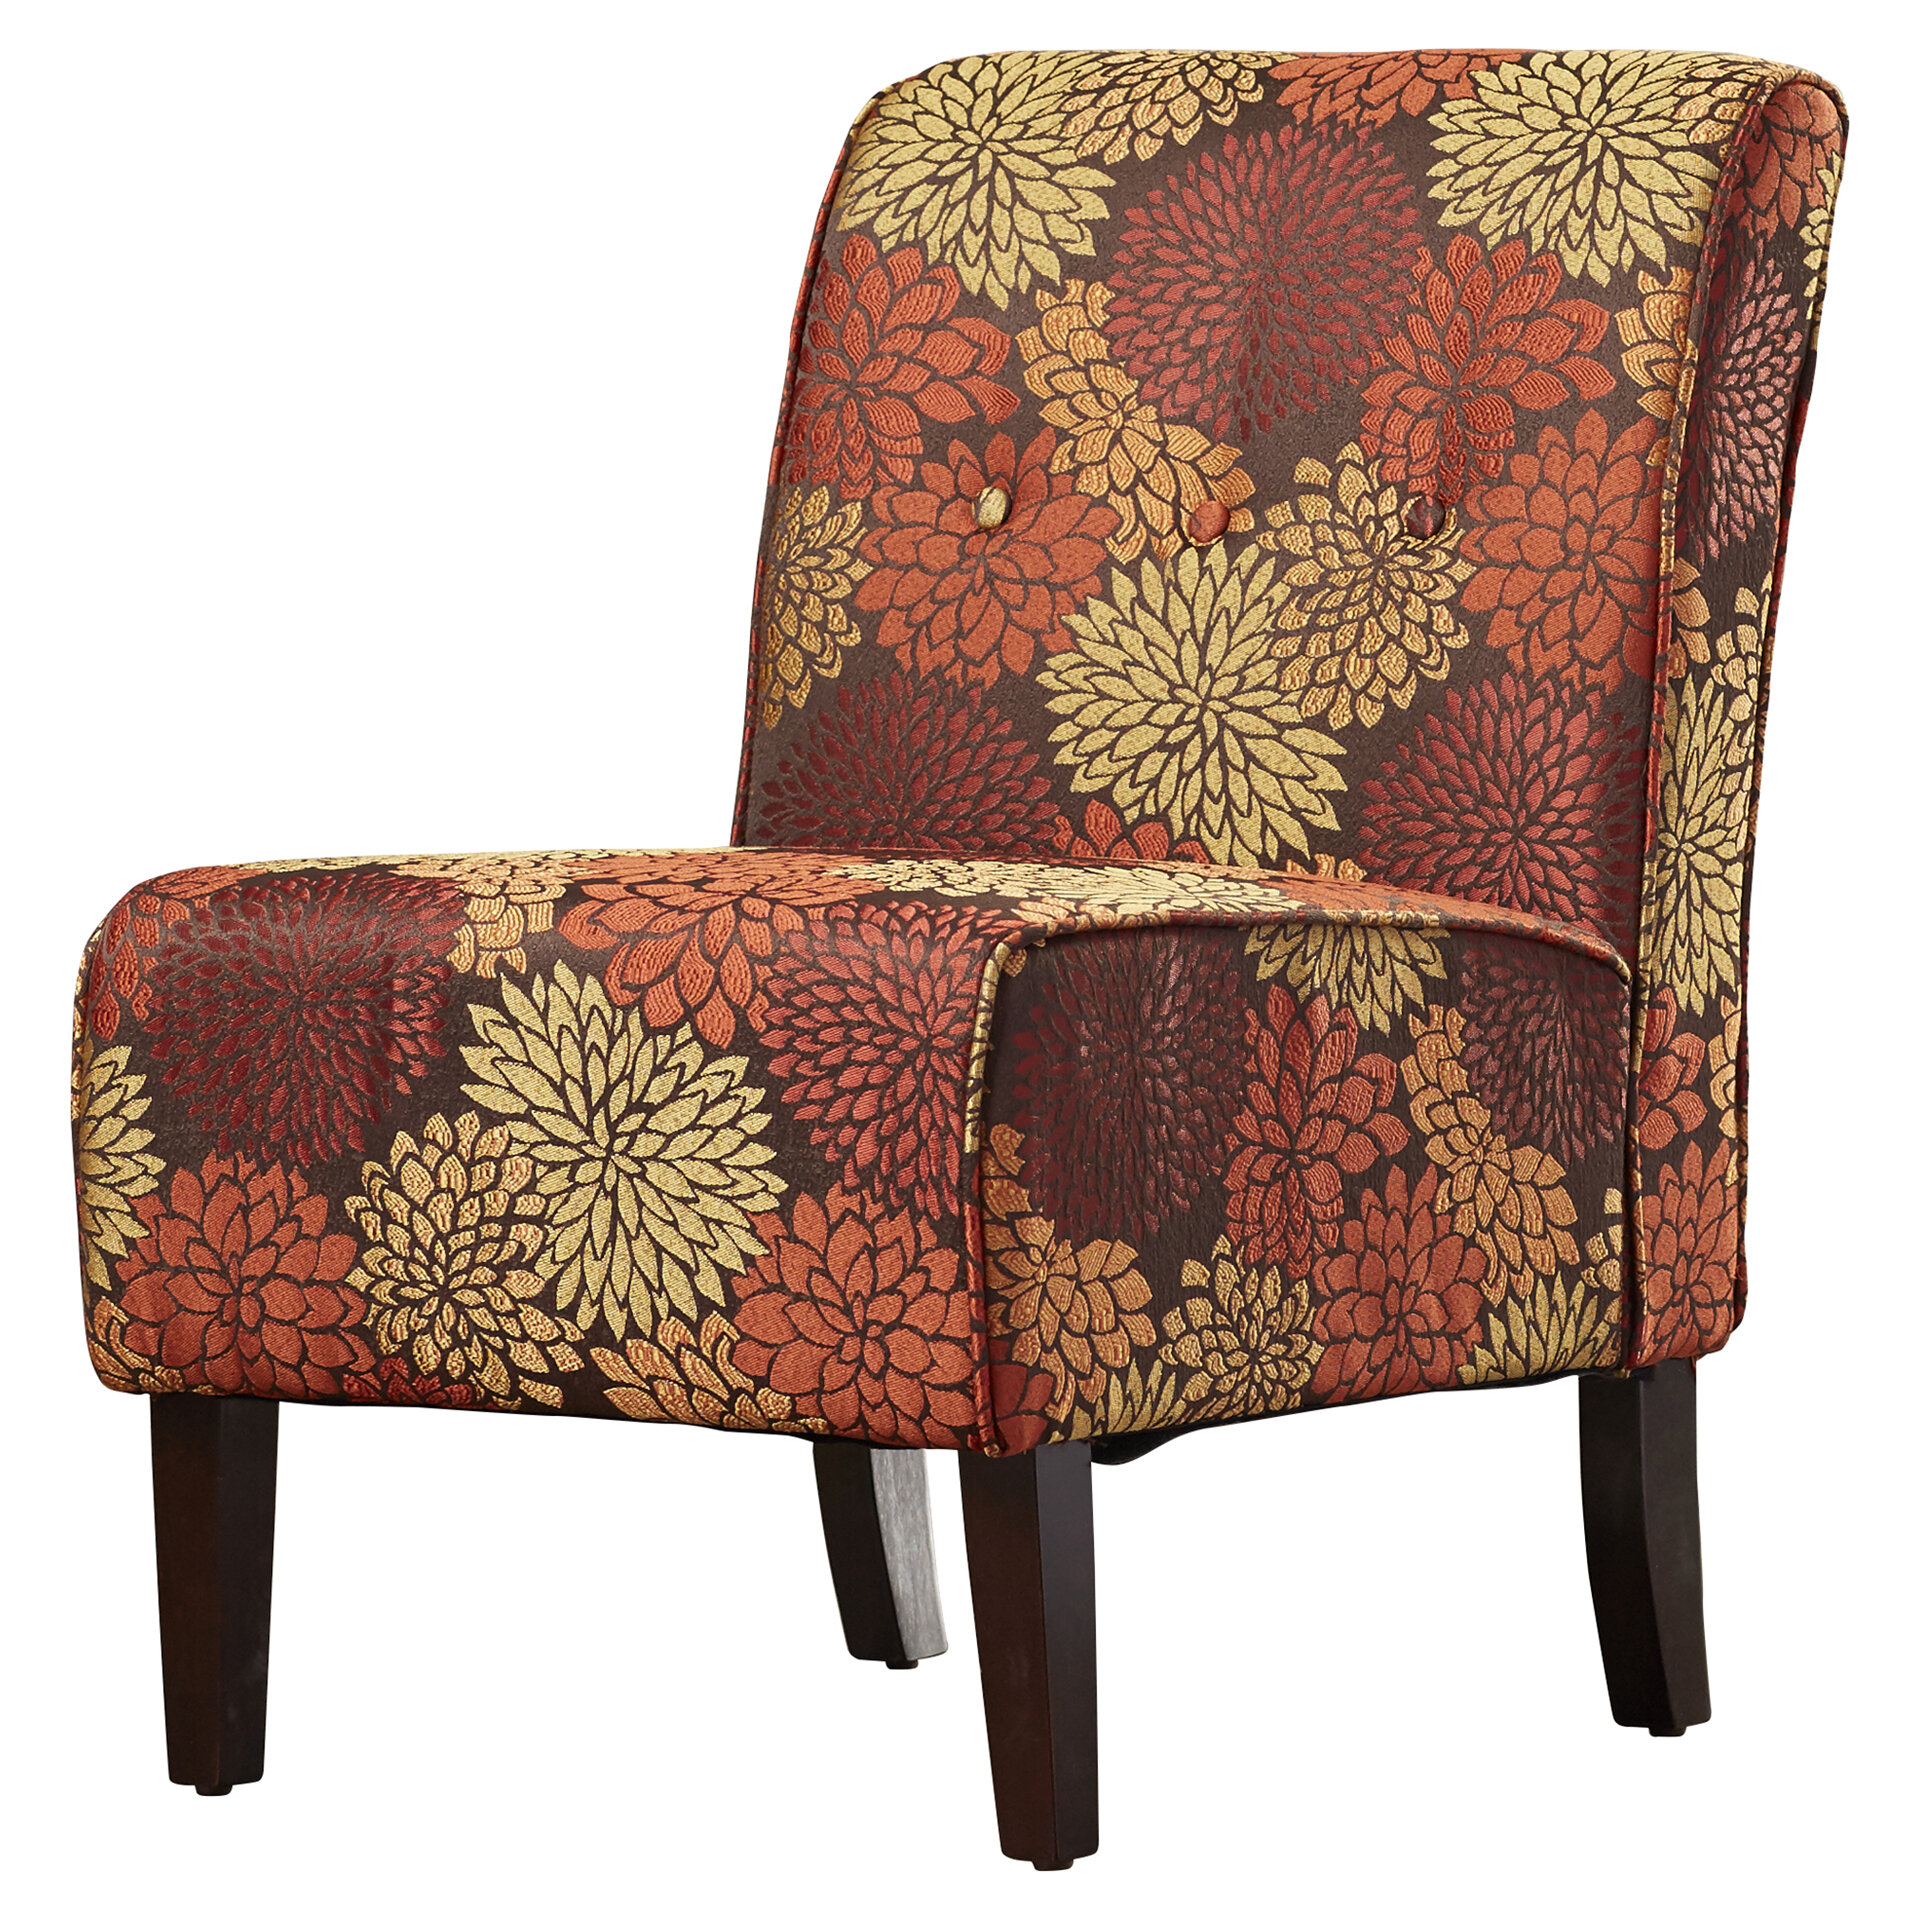 "Bram 23"" Slipper Chair In Gozzoli Slipper Chairs (View 8 of 15)"